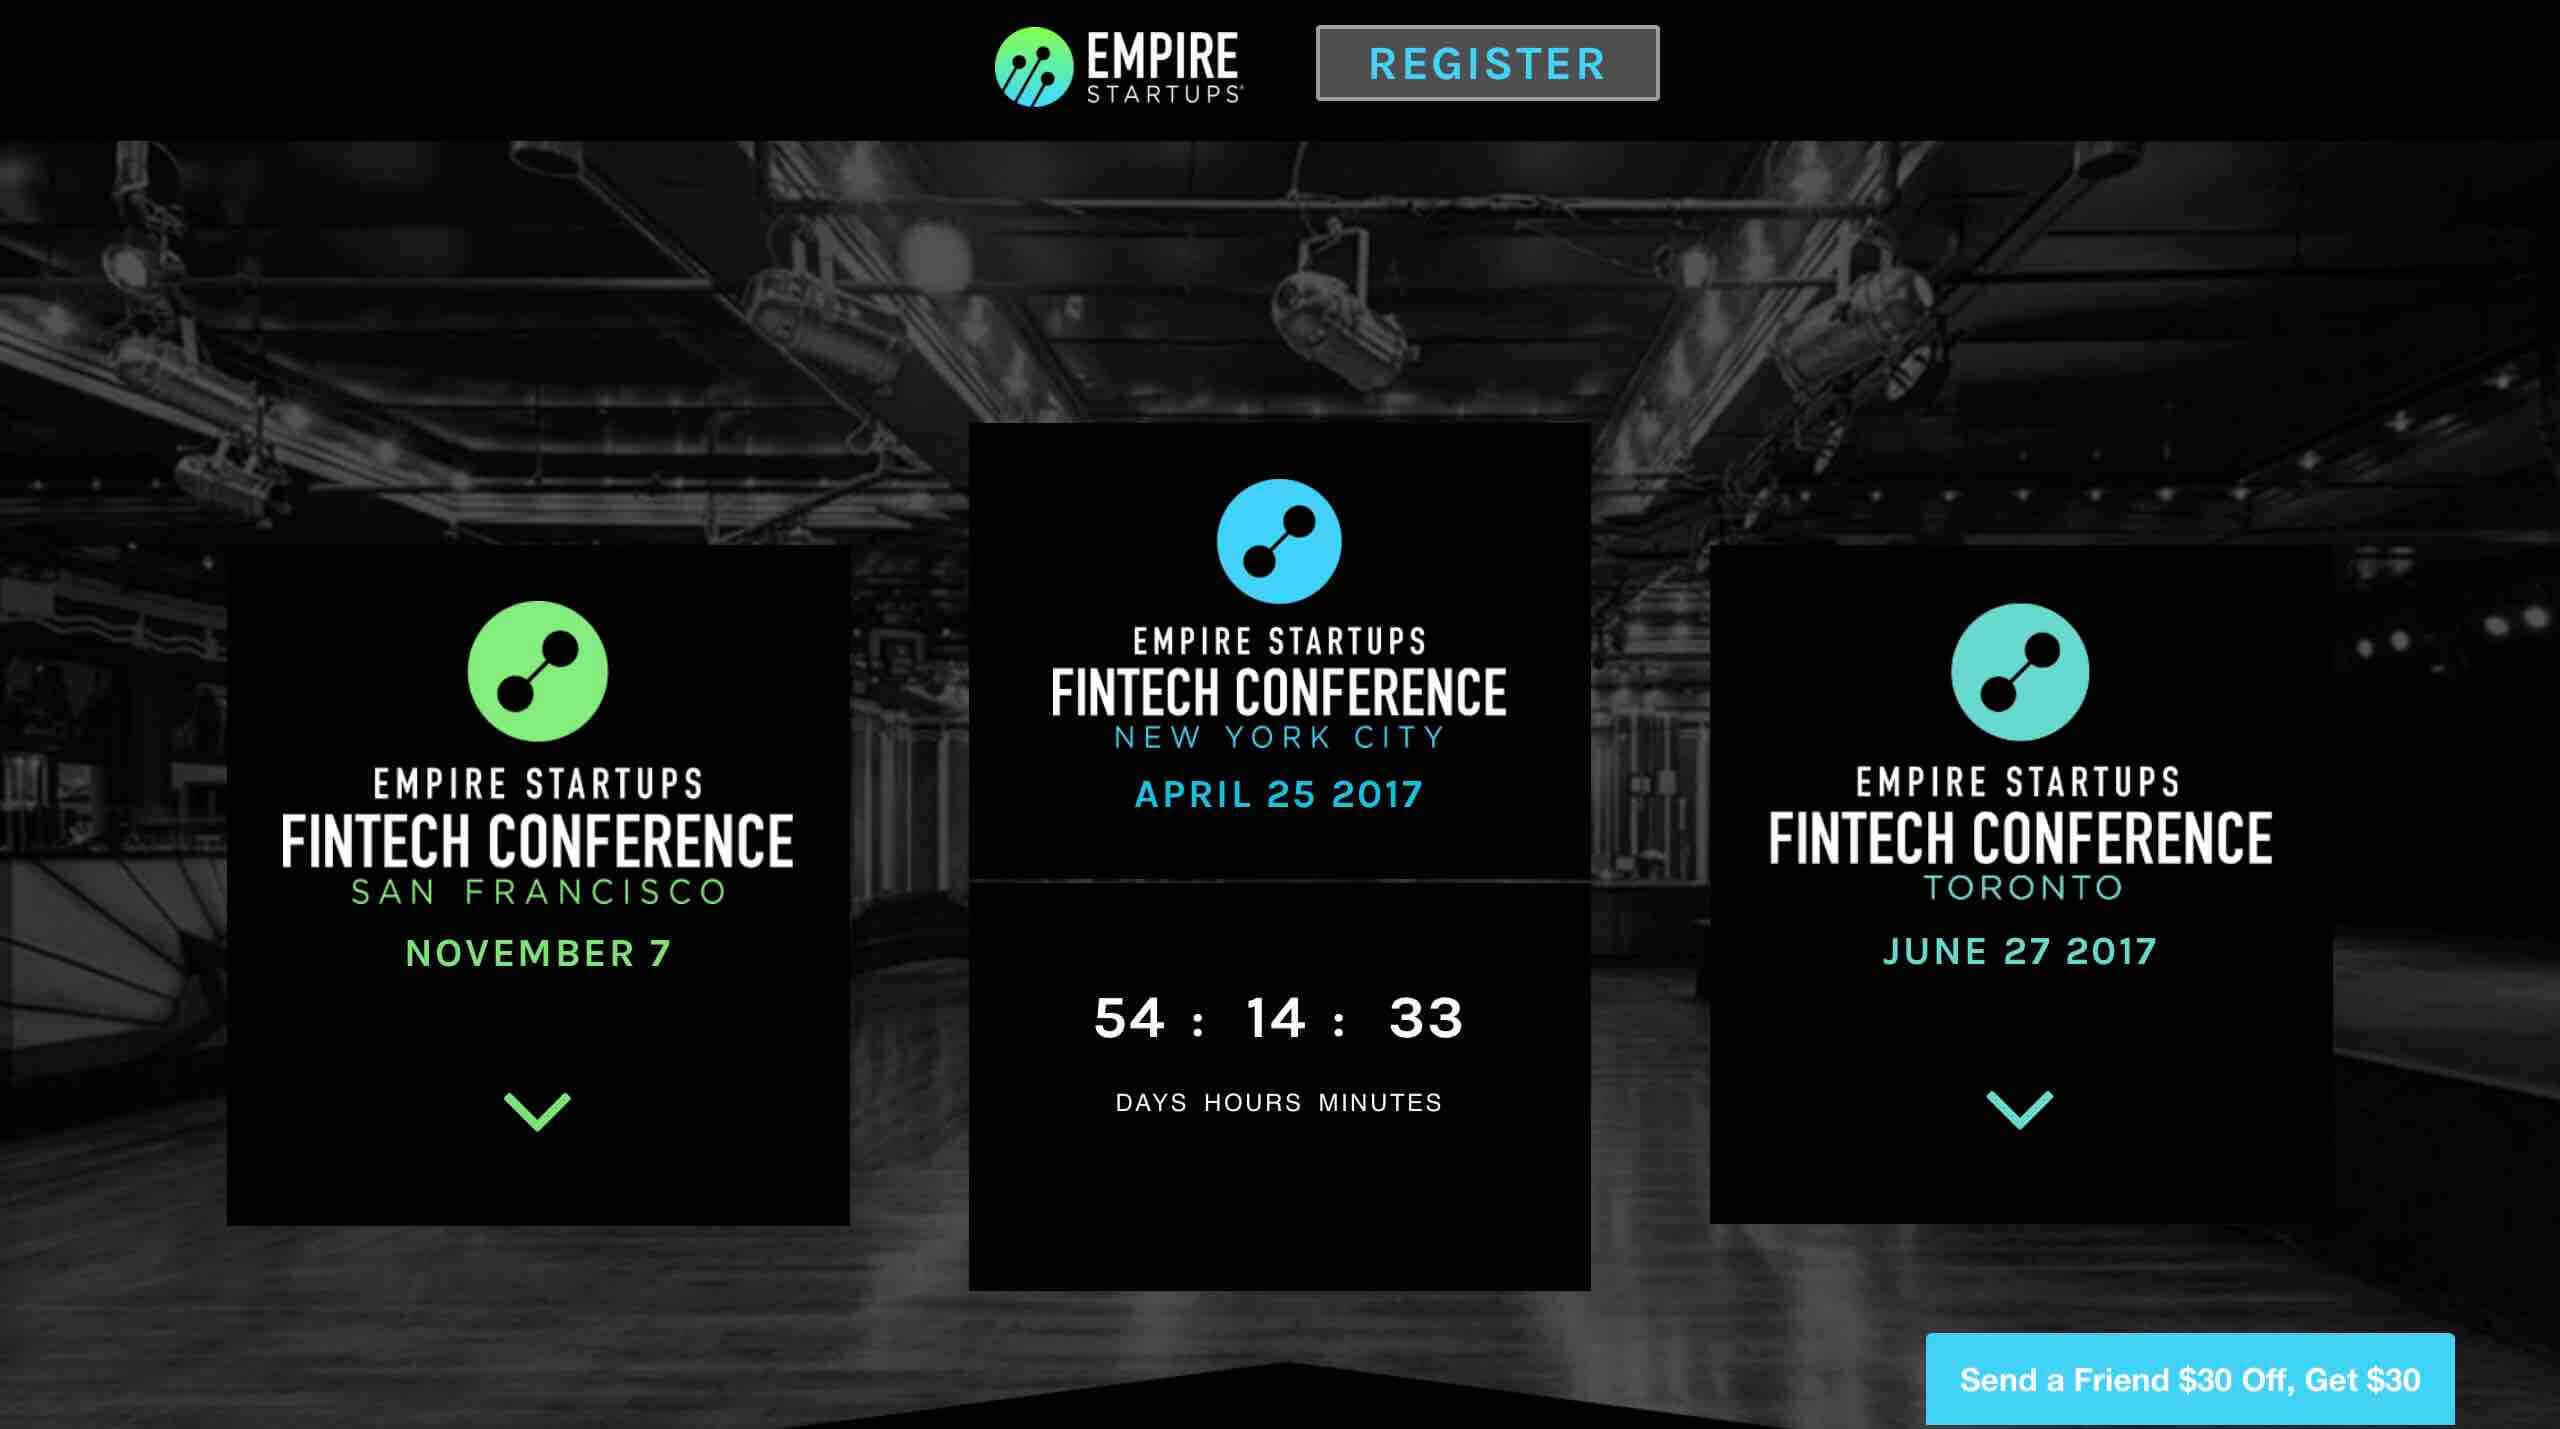 empire fintech conference